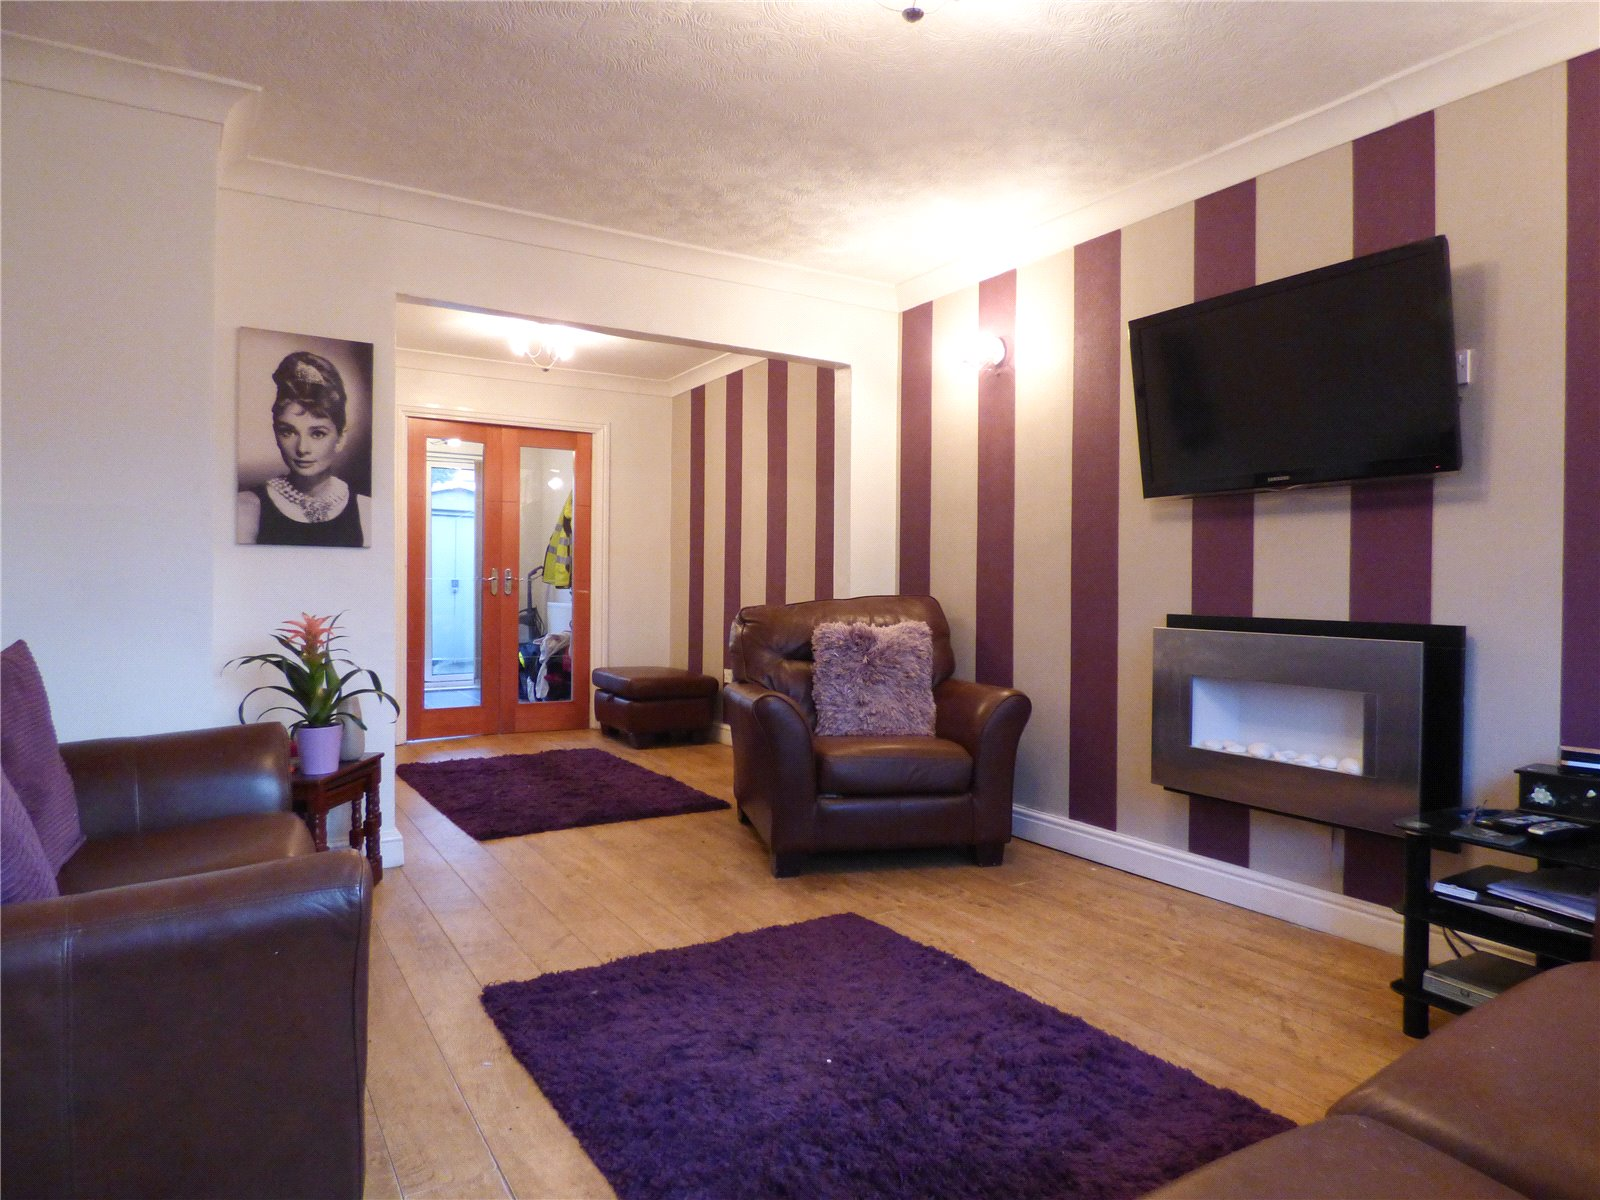 3 Bedrooms Terraced House for sale in King Street, Mossley, Ashton-under-Lyne, Greater Manchester, OL5